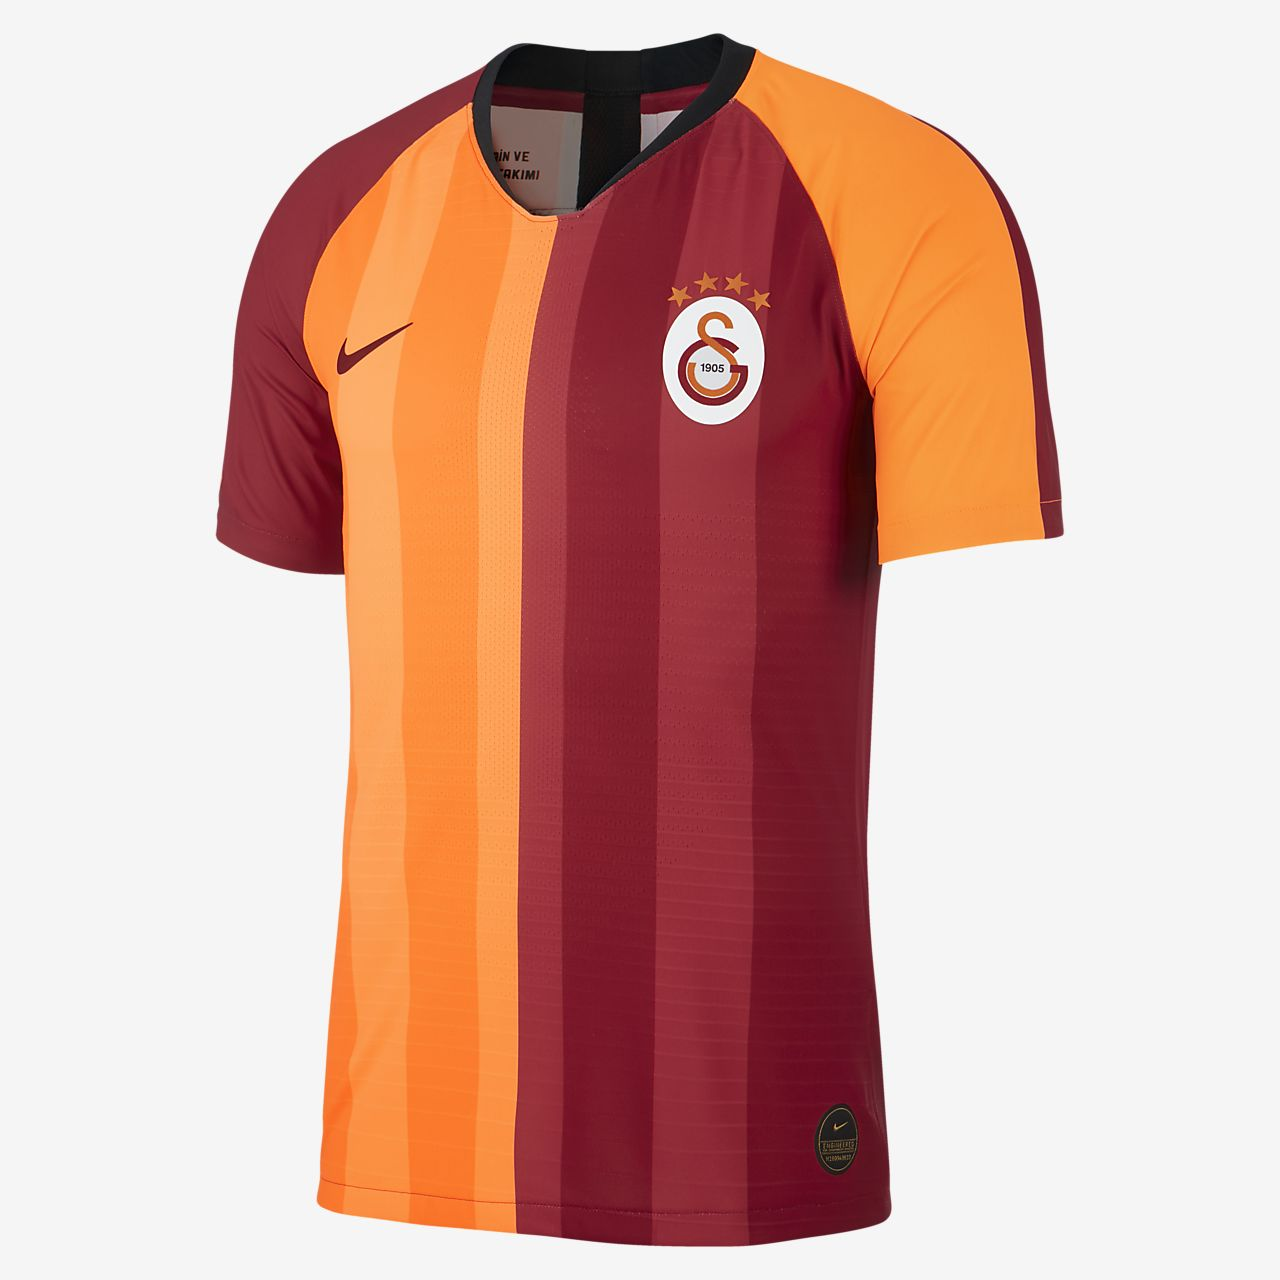 Maillot de football Galatasaray 2019/20 Vapor Match Home pour Homme